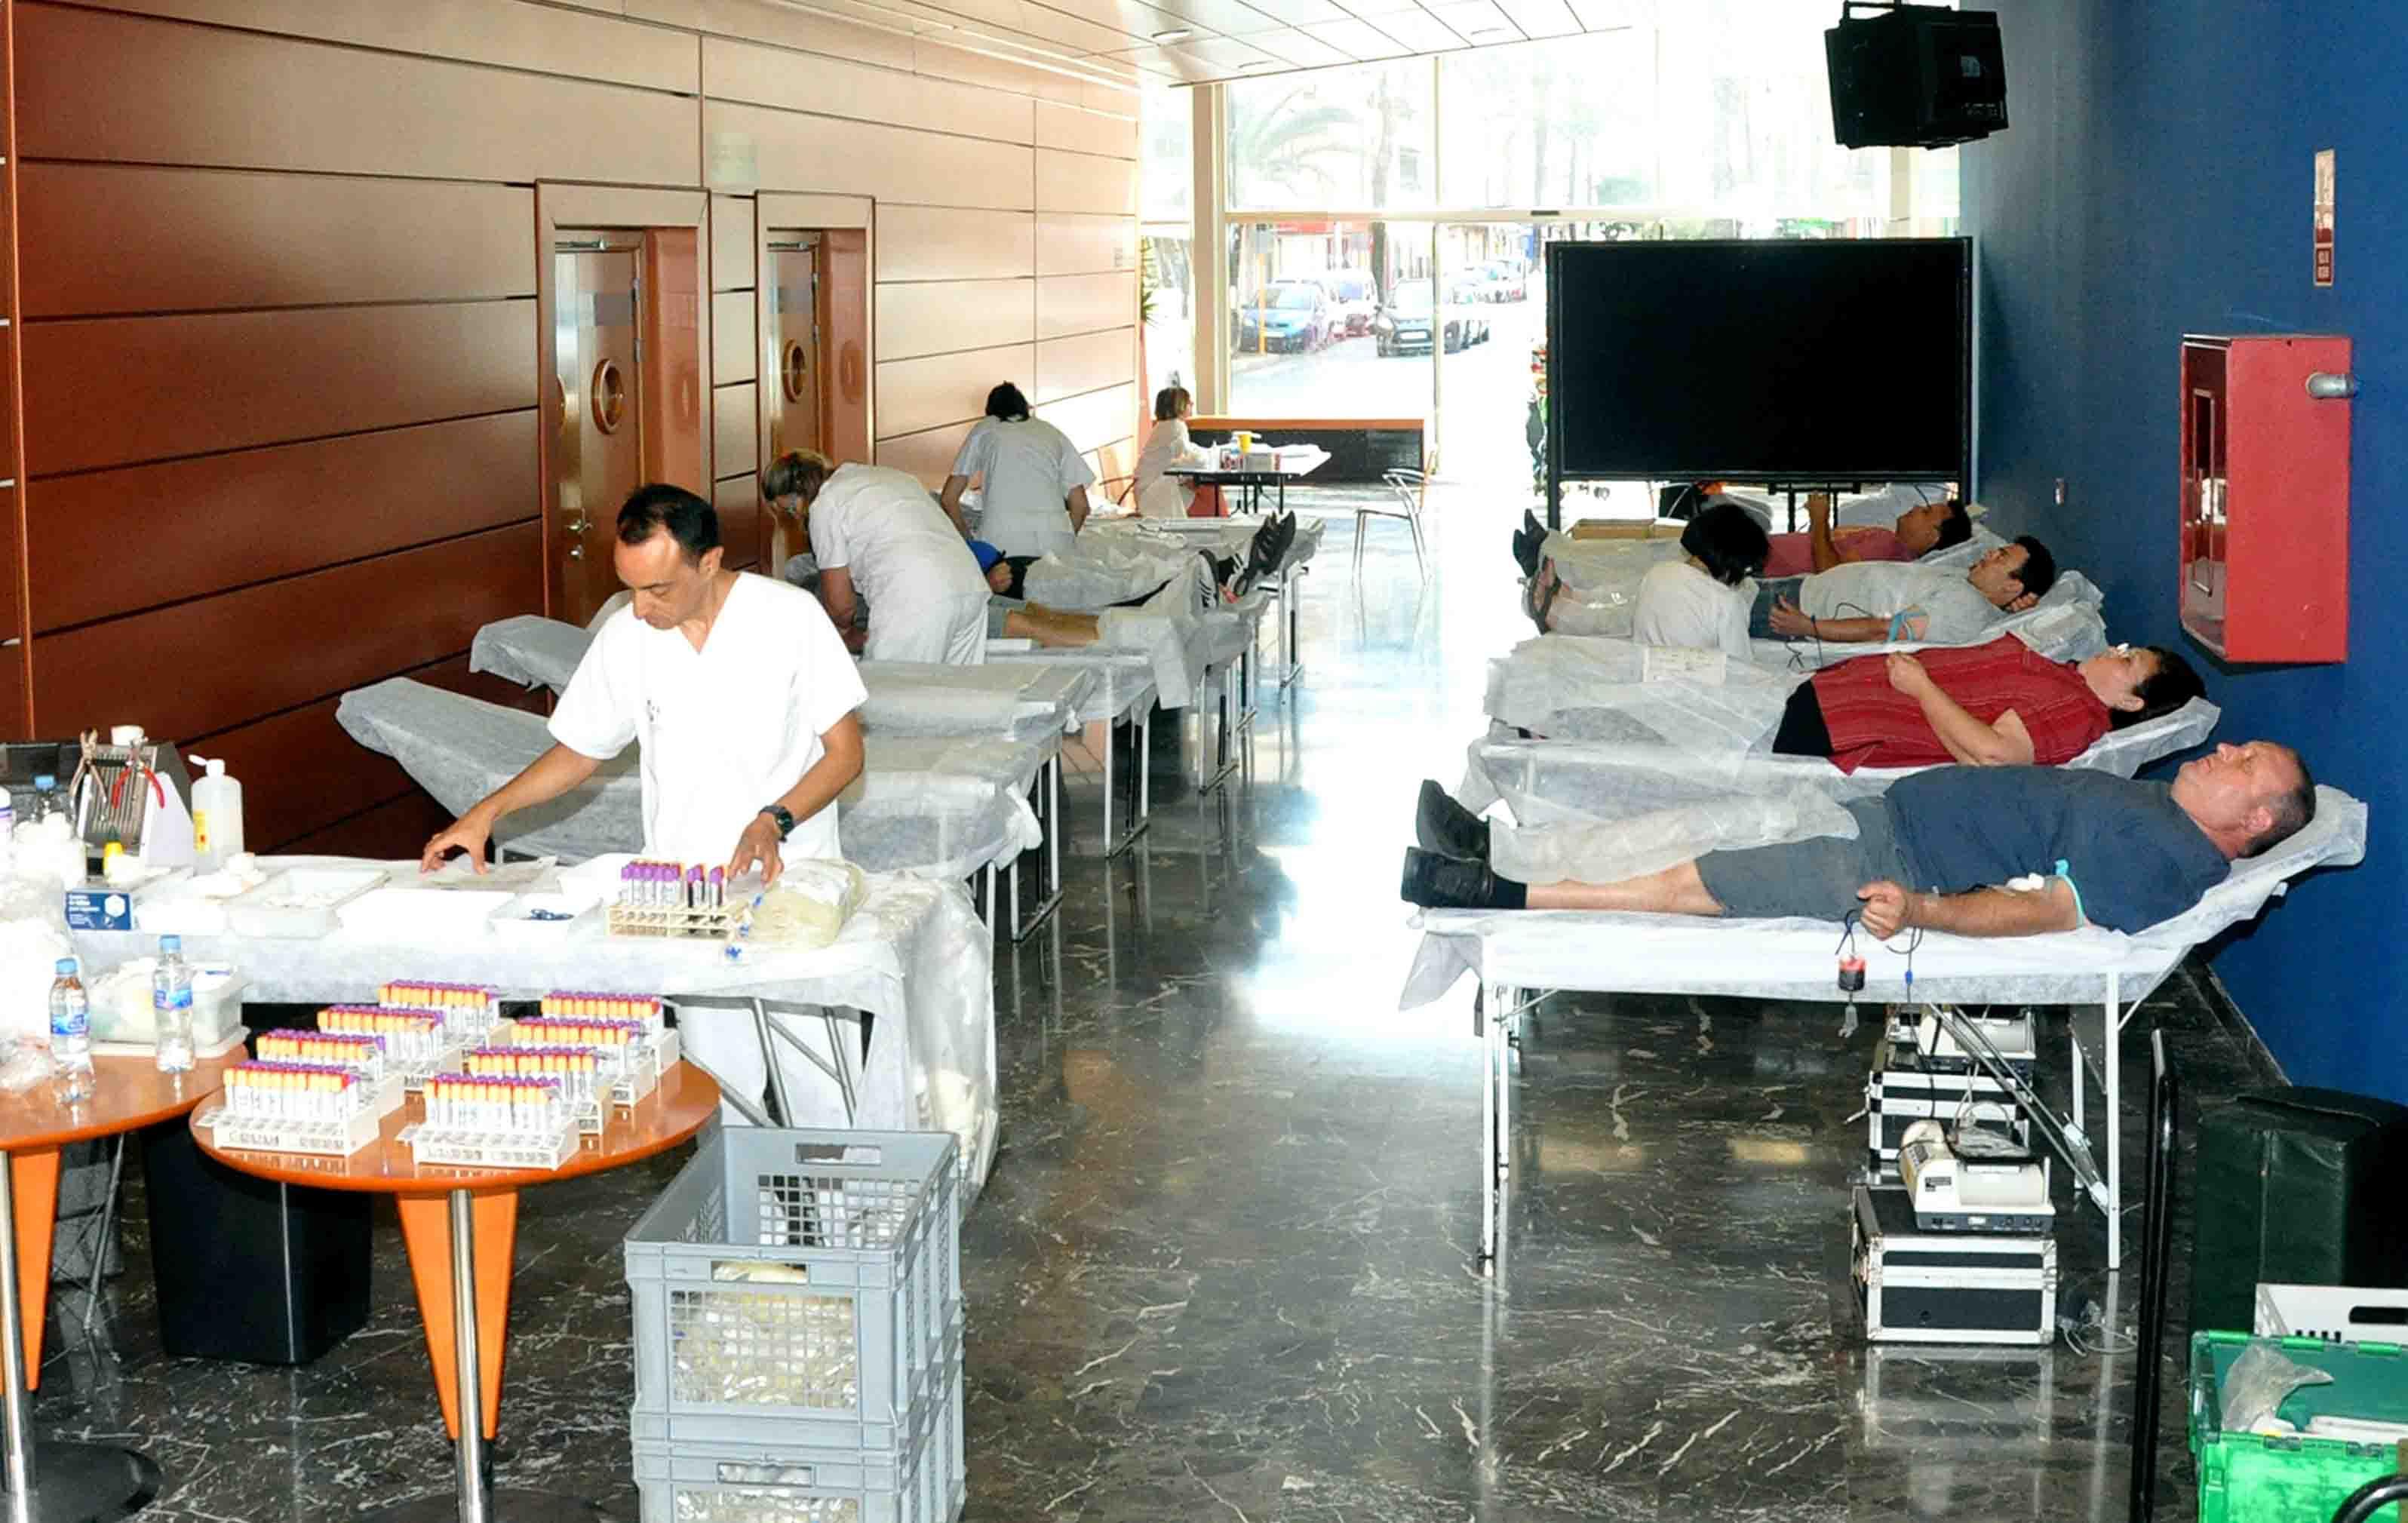 Paiporta celebra mañana la fiesta de la donación de sangre